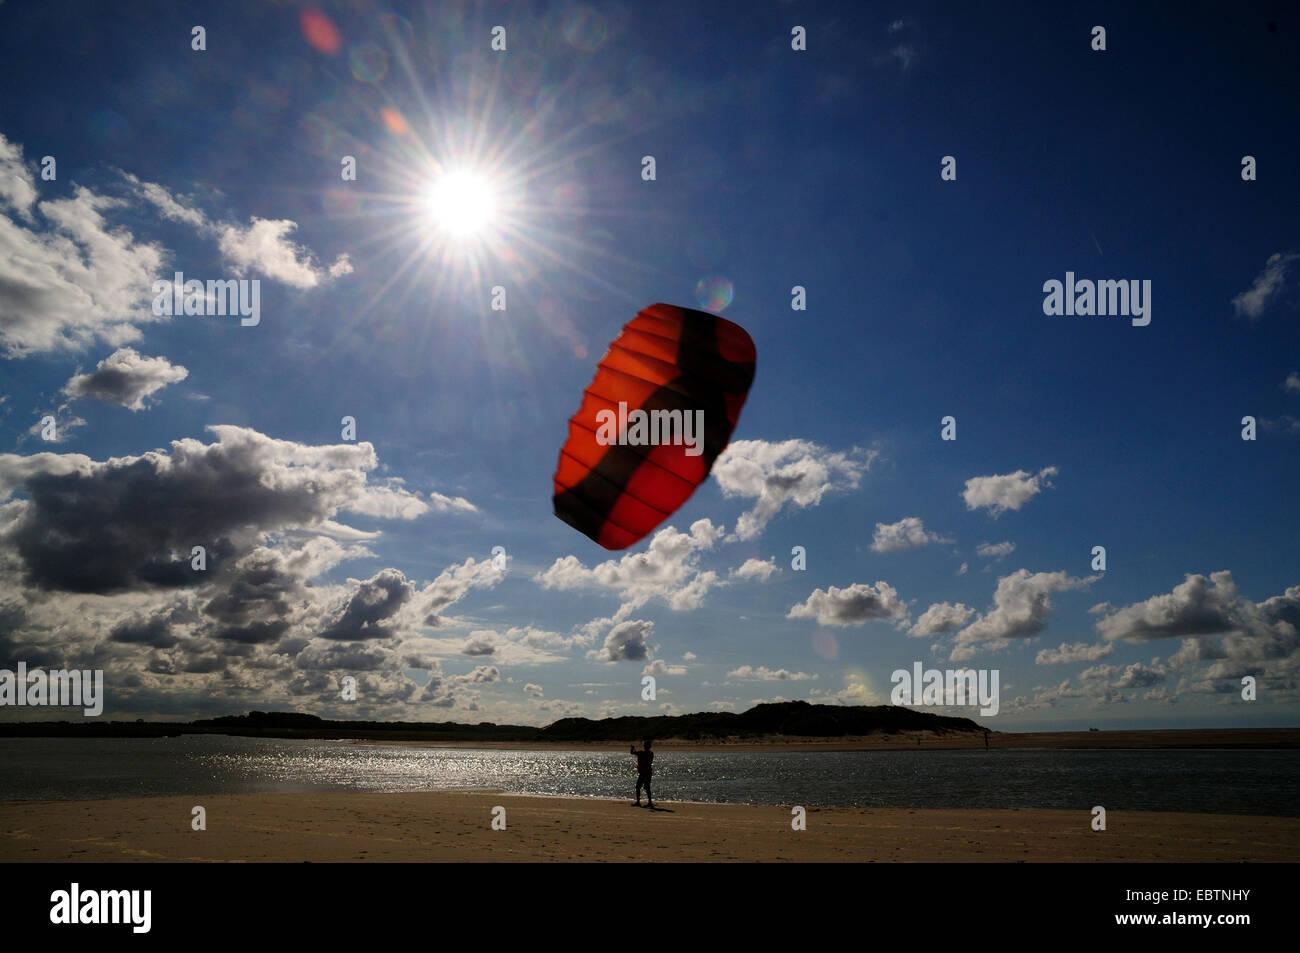 teenager with kite on the beach, Netherlands, Cadzand Stock Photo